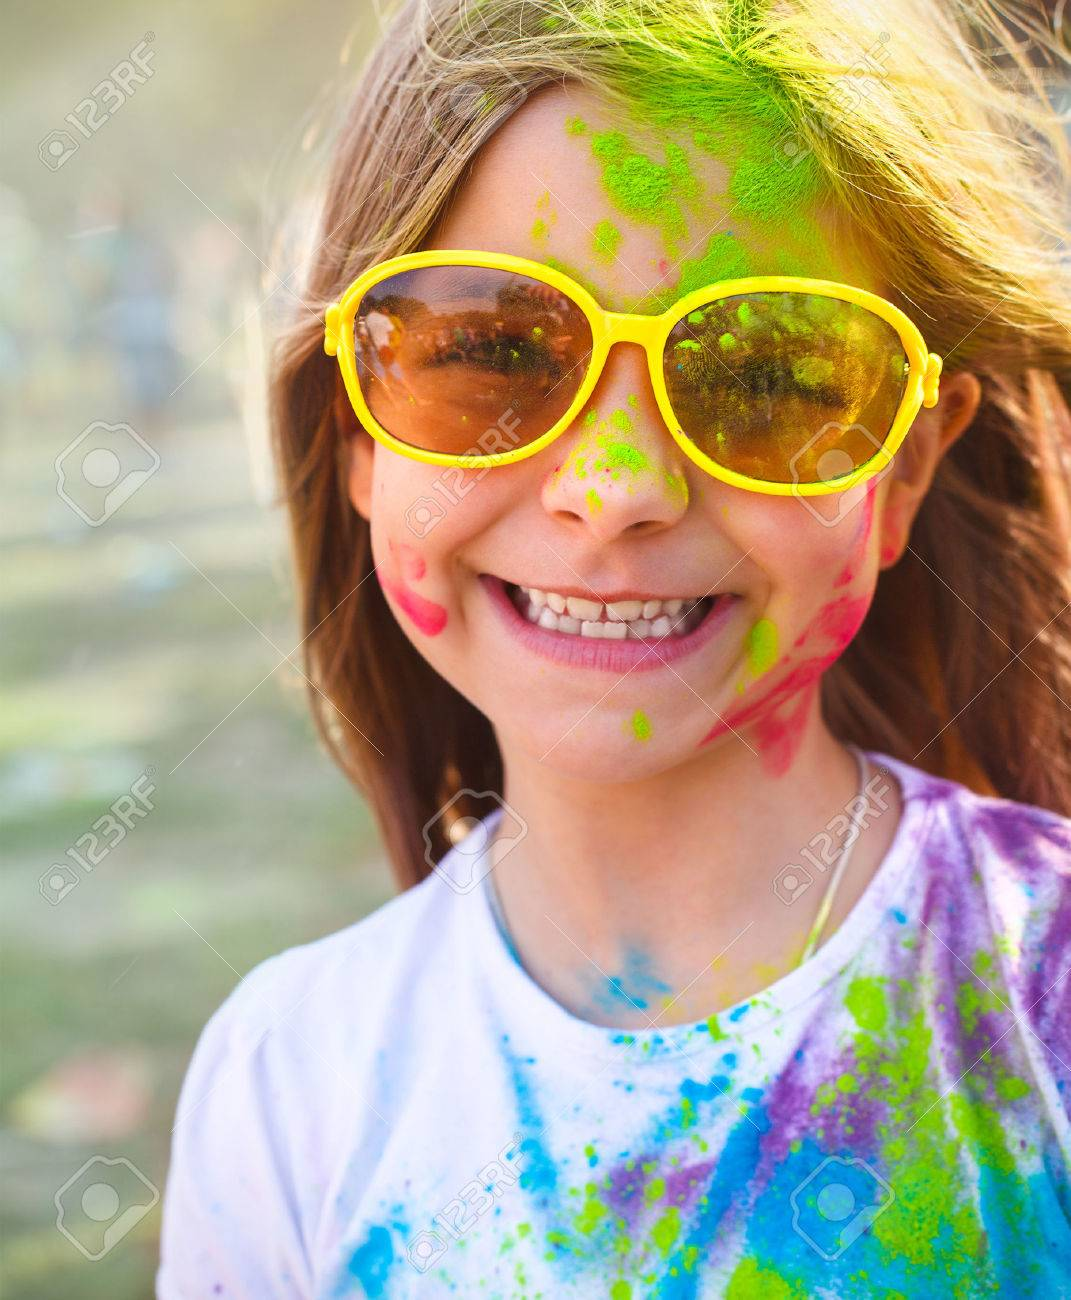 Portrait of happy cute litttle girl on holi color festival - 37522942